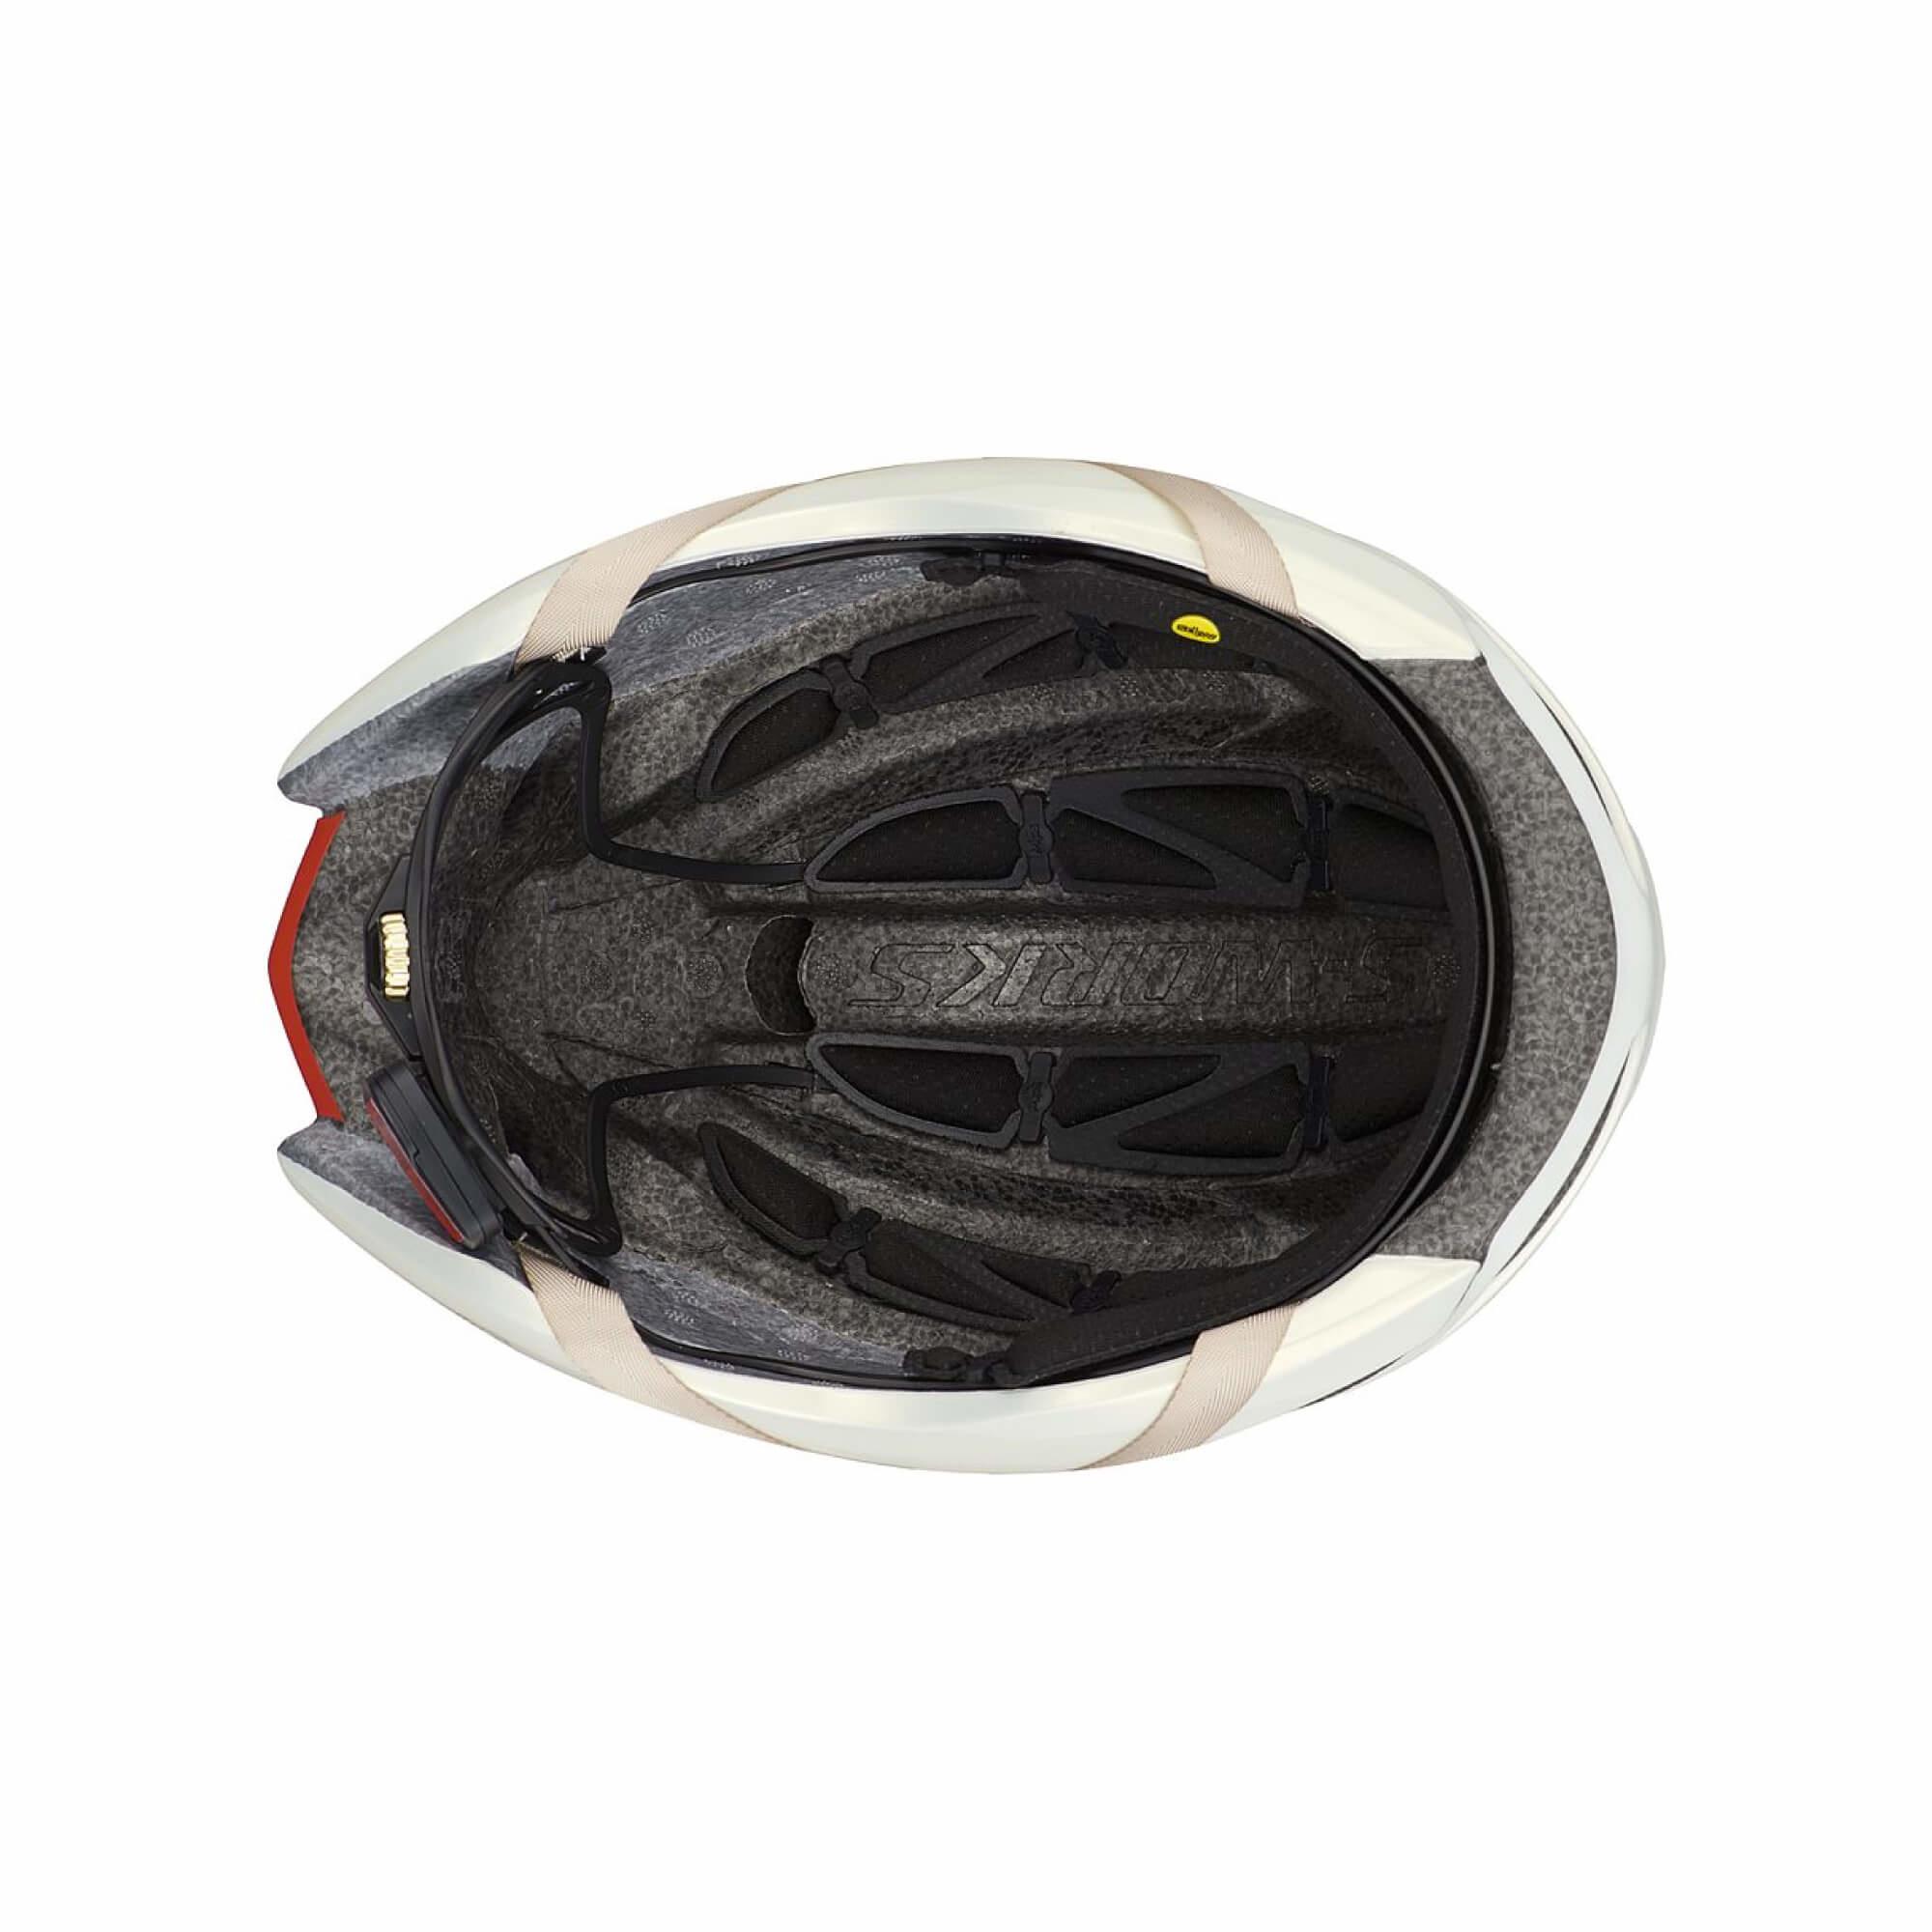 S-Works Evade II Helmet Angi Mips Sagan Disruption 2022-7